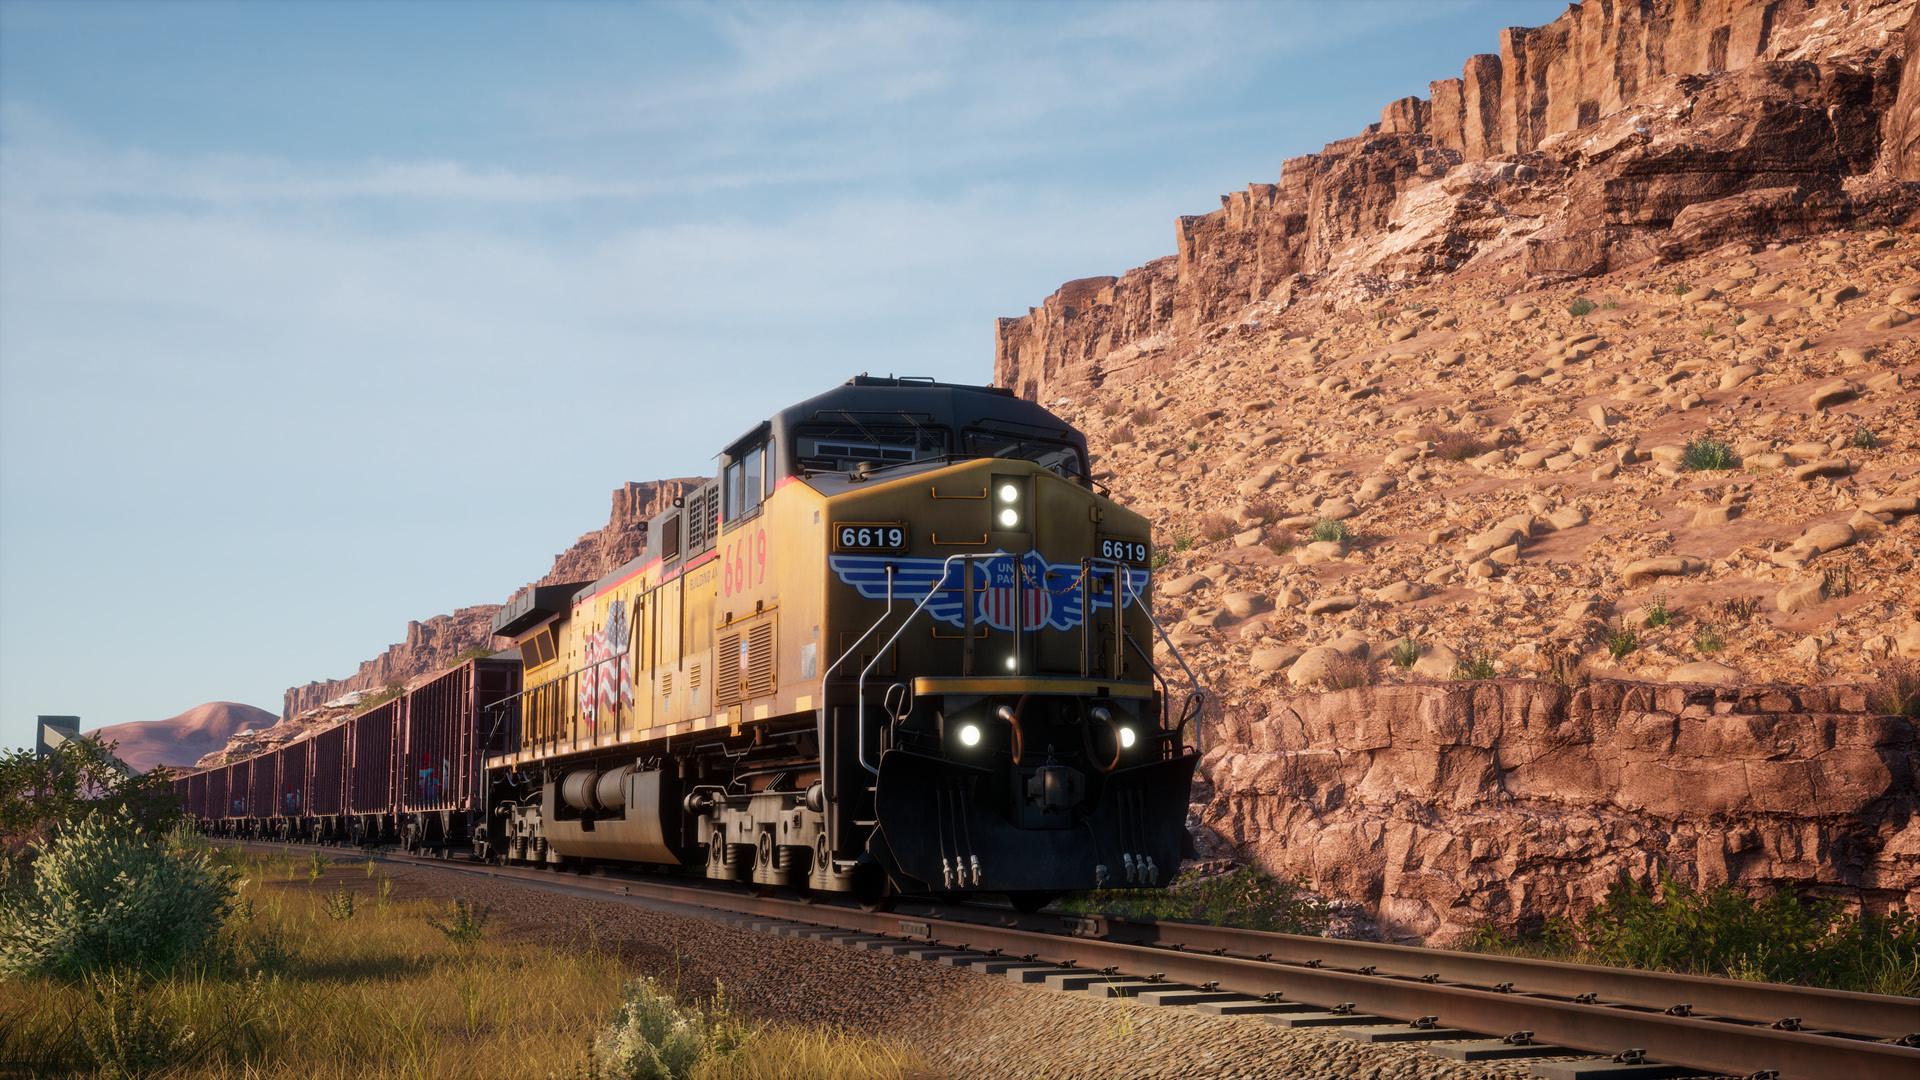 Train Sim World 2 - Cane Creek: Thompson - Potash DLC | Dovetail Games, Skyhook Games